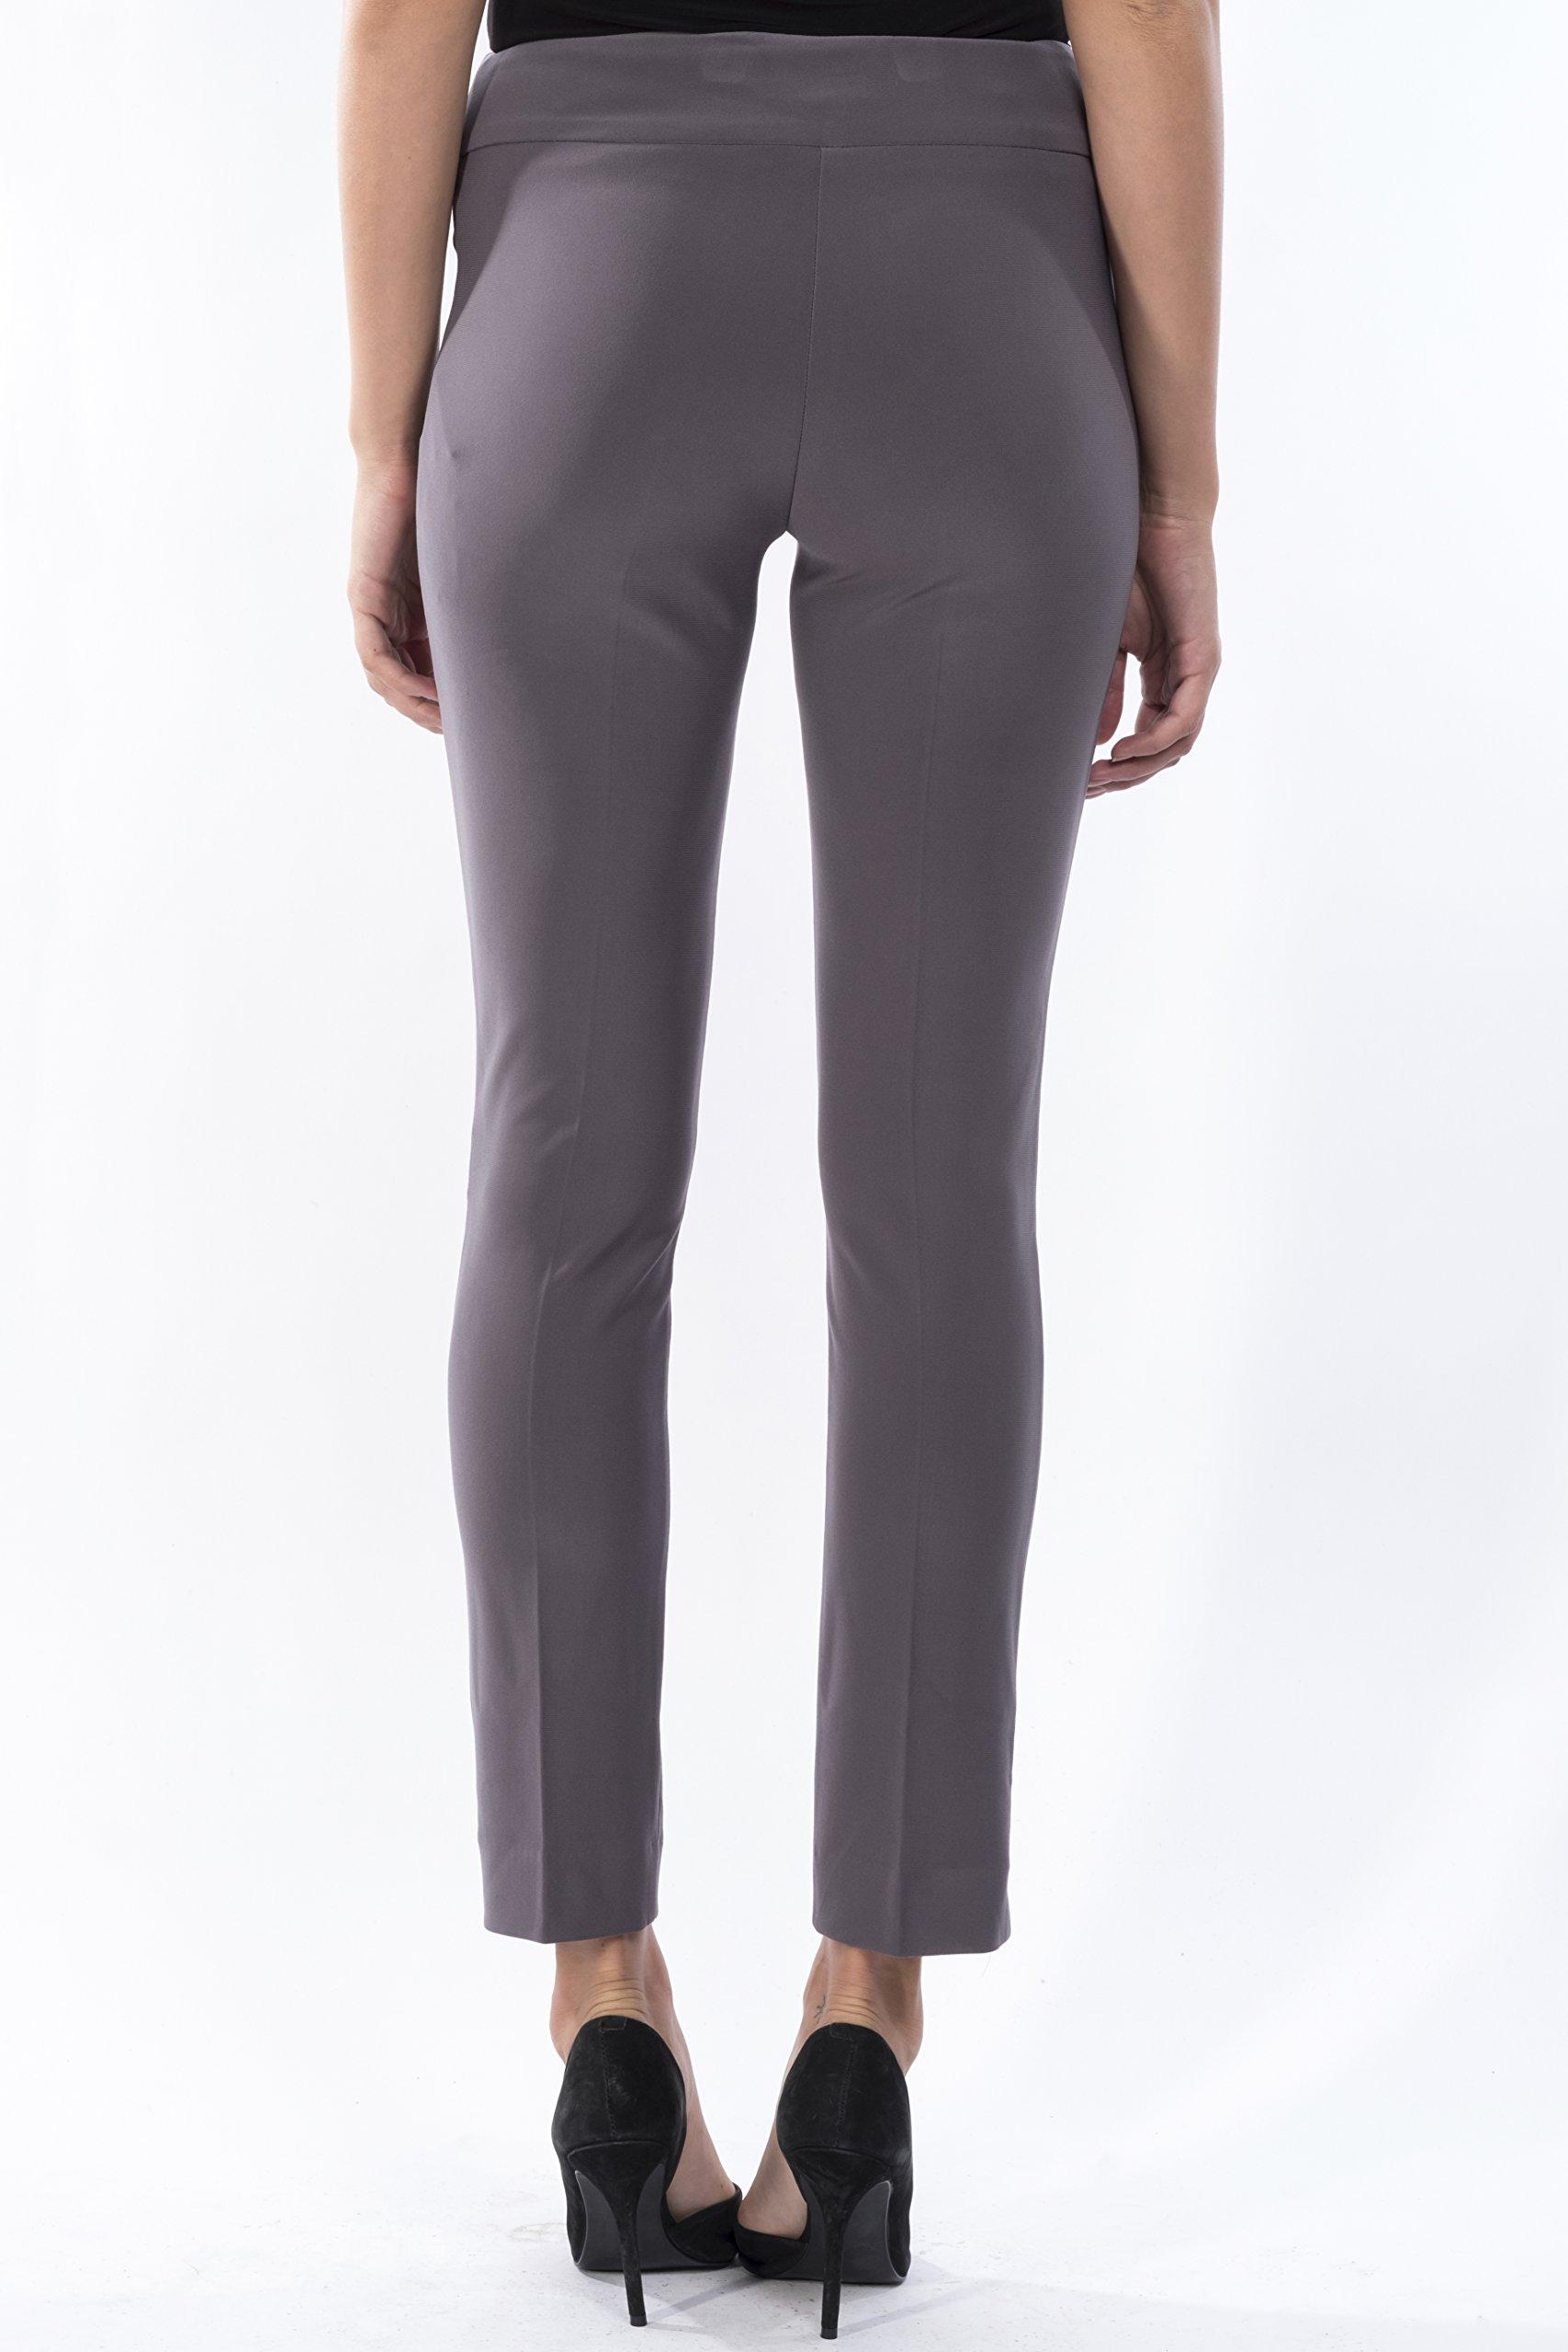 Joseph Ribkoff Ankle Length Wide Waistband Tailored Pant Zipperless - Style 144092 - Size 18 by Joseph Ribkoff (Image #3)